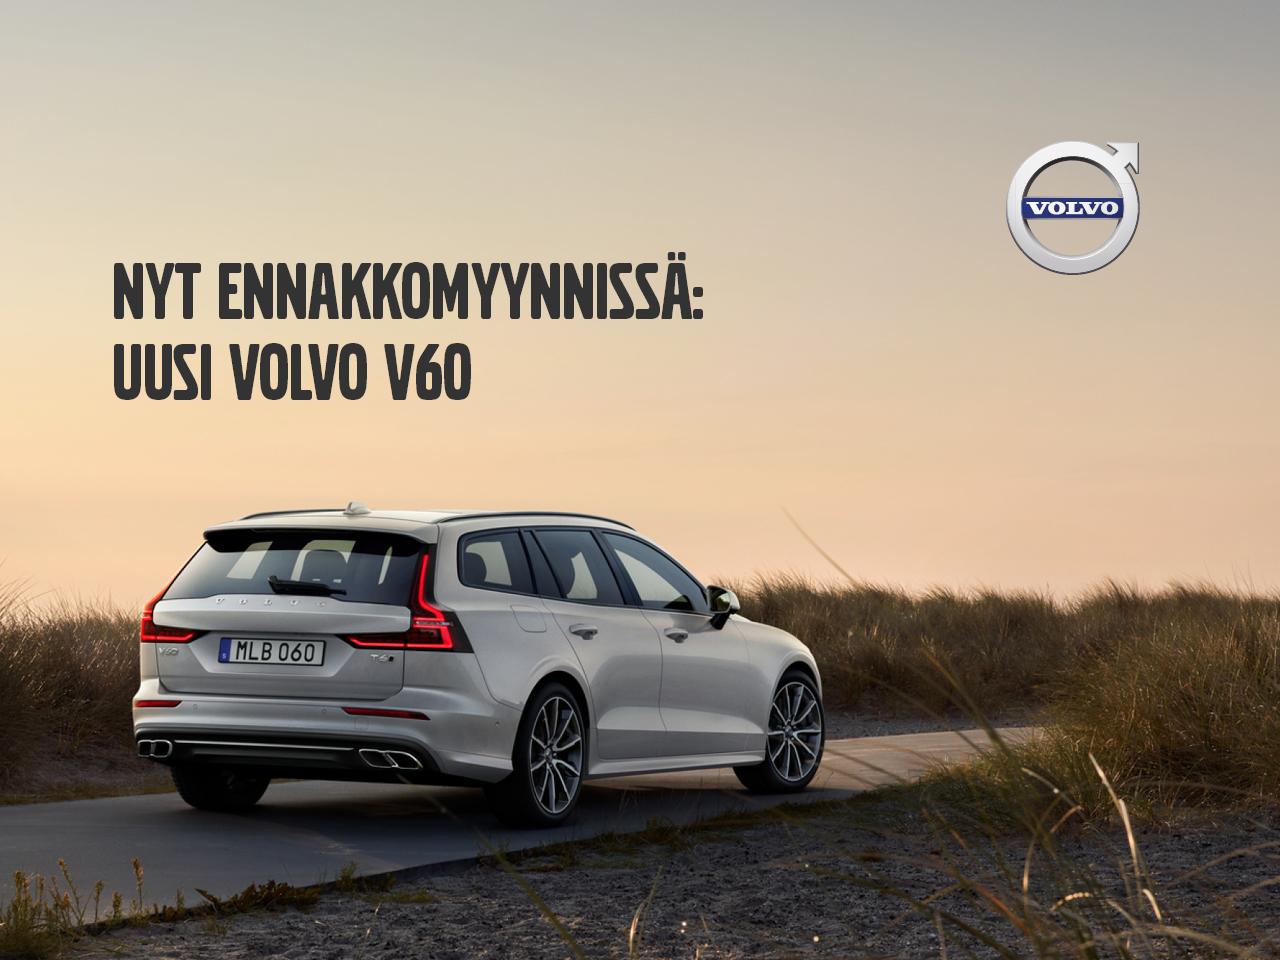 Volvo V60 - uusi visio farmarista